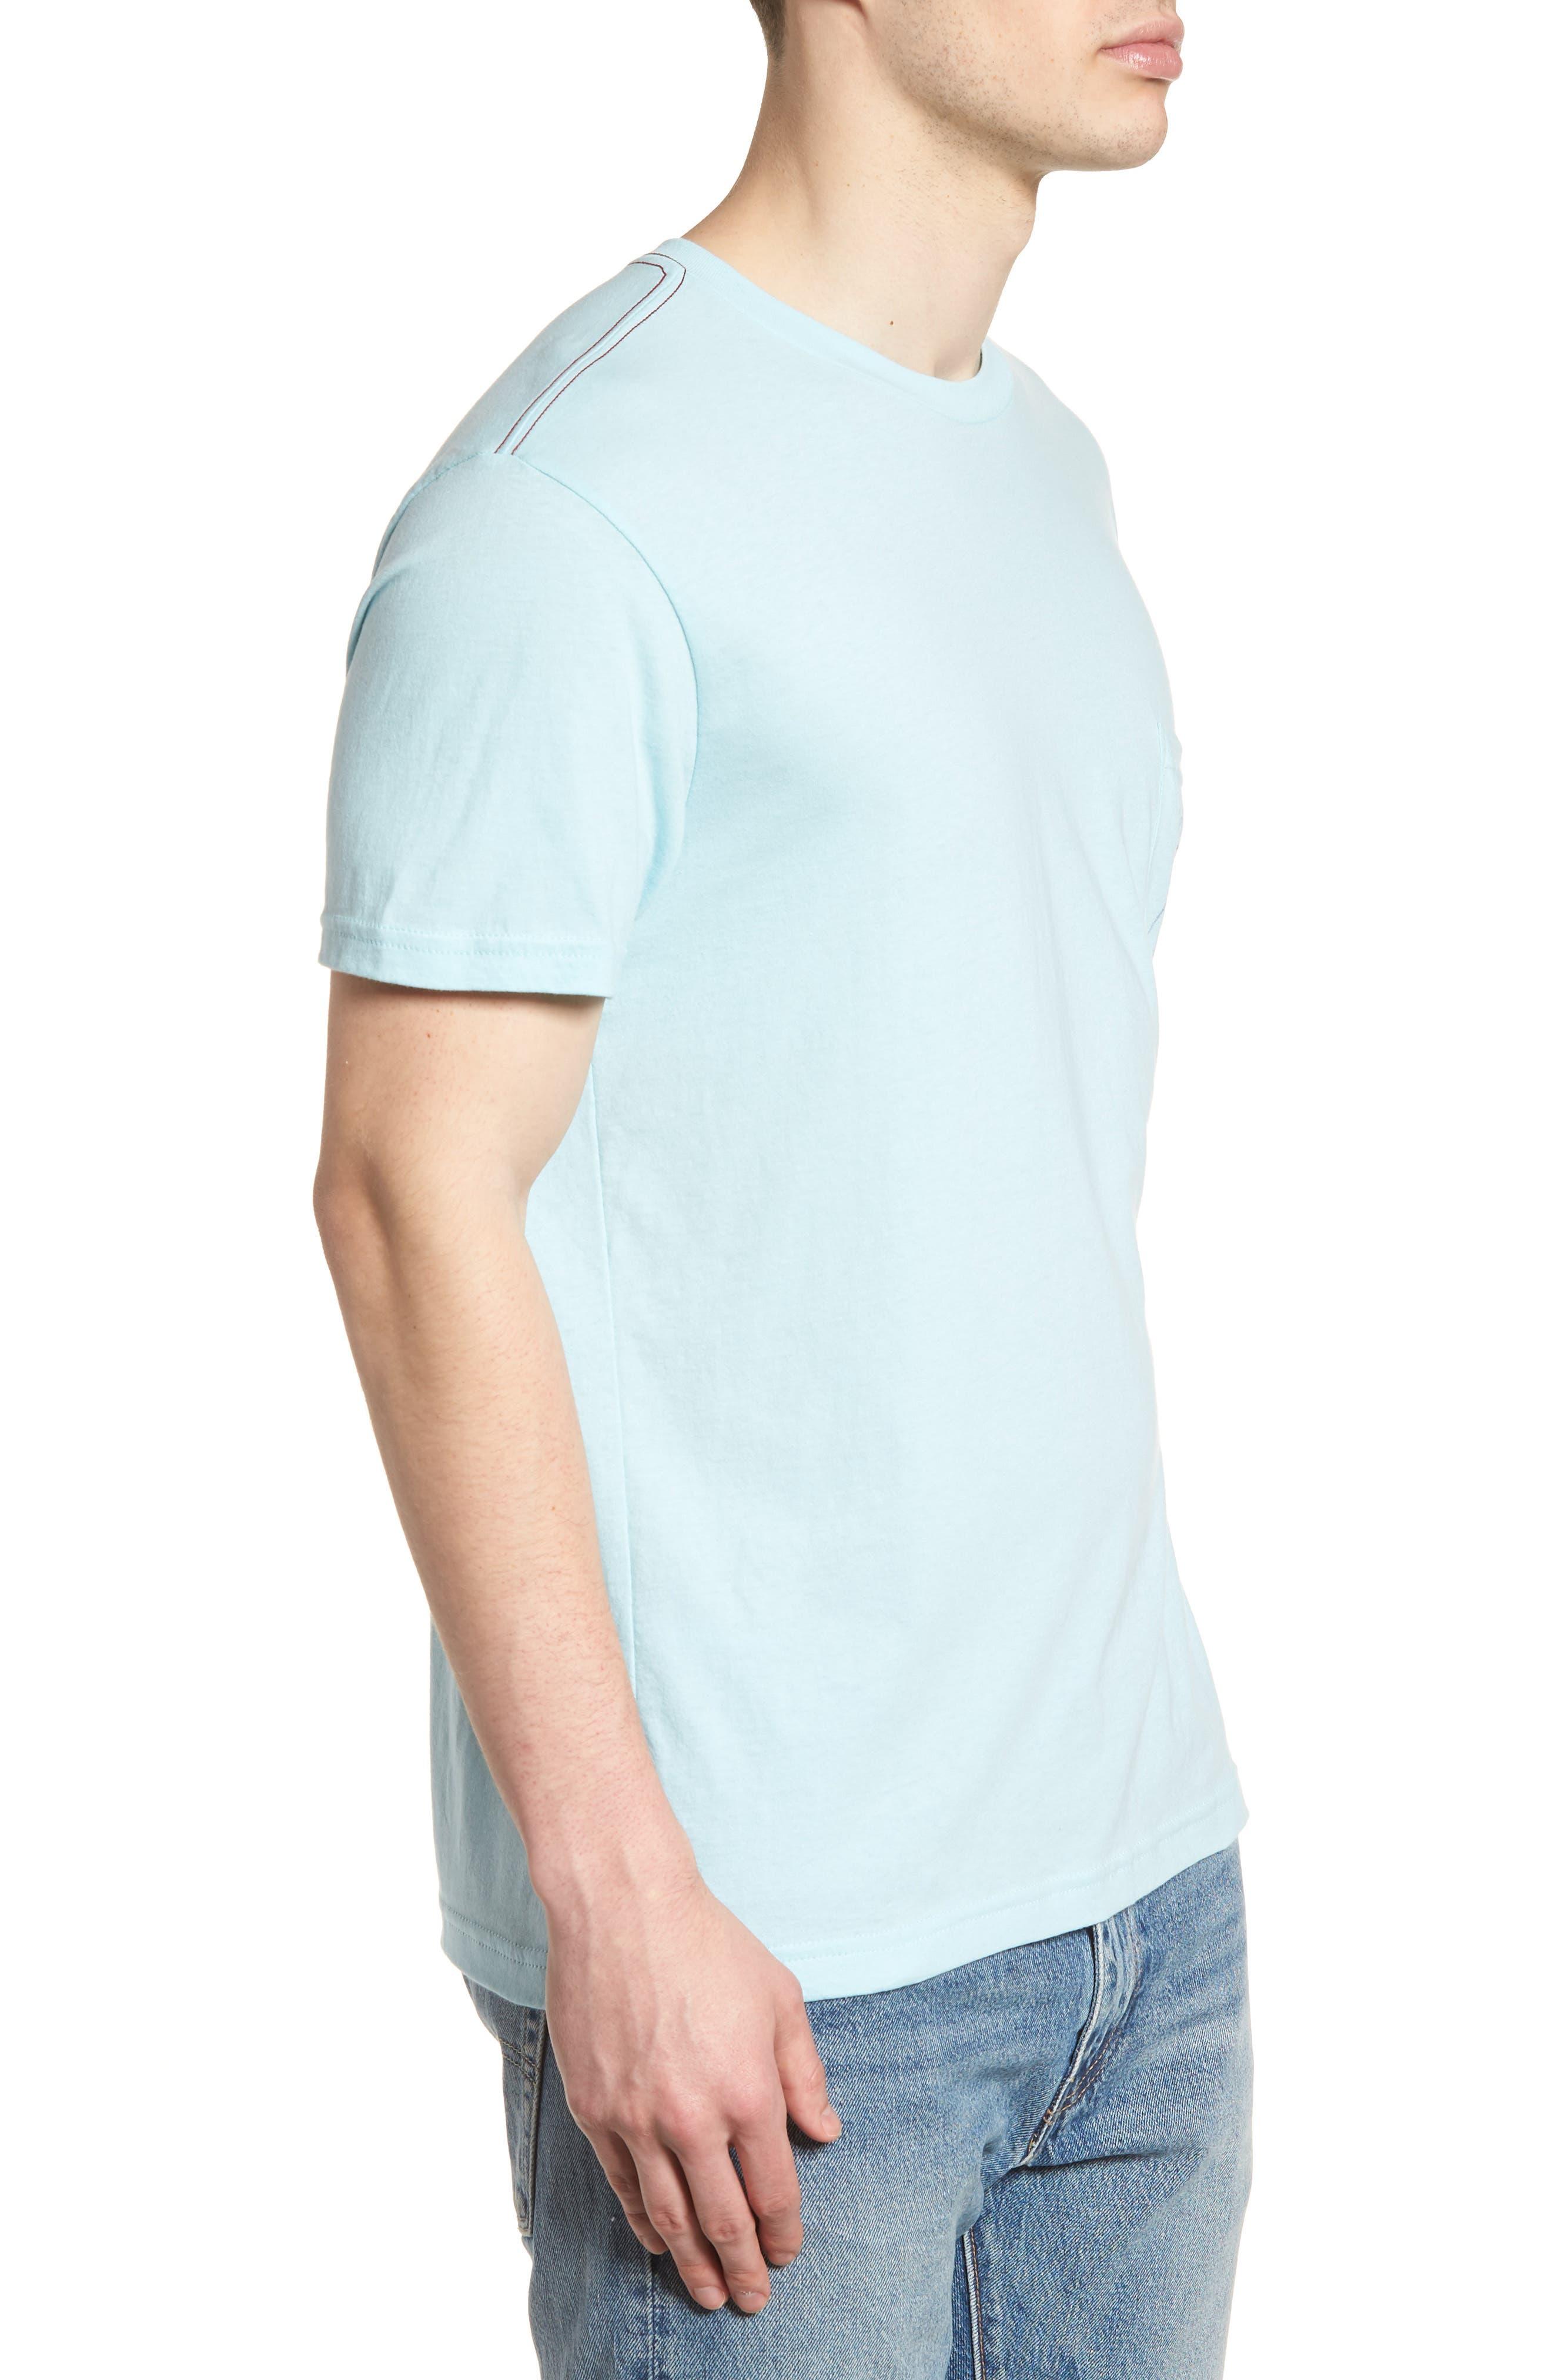 Thumbs Up T-Shirt,                             Alternate thumbnail 4, color,                             Blue